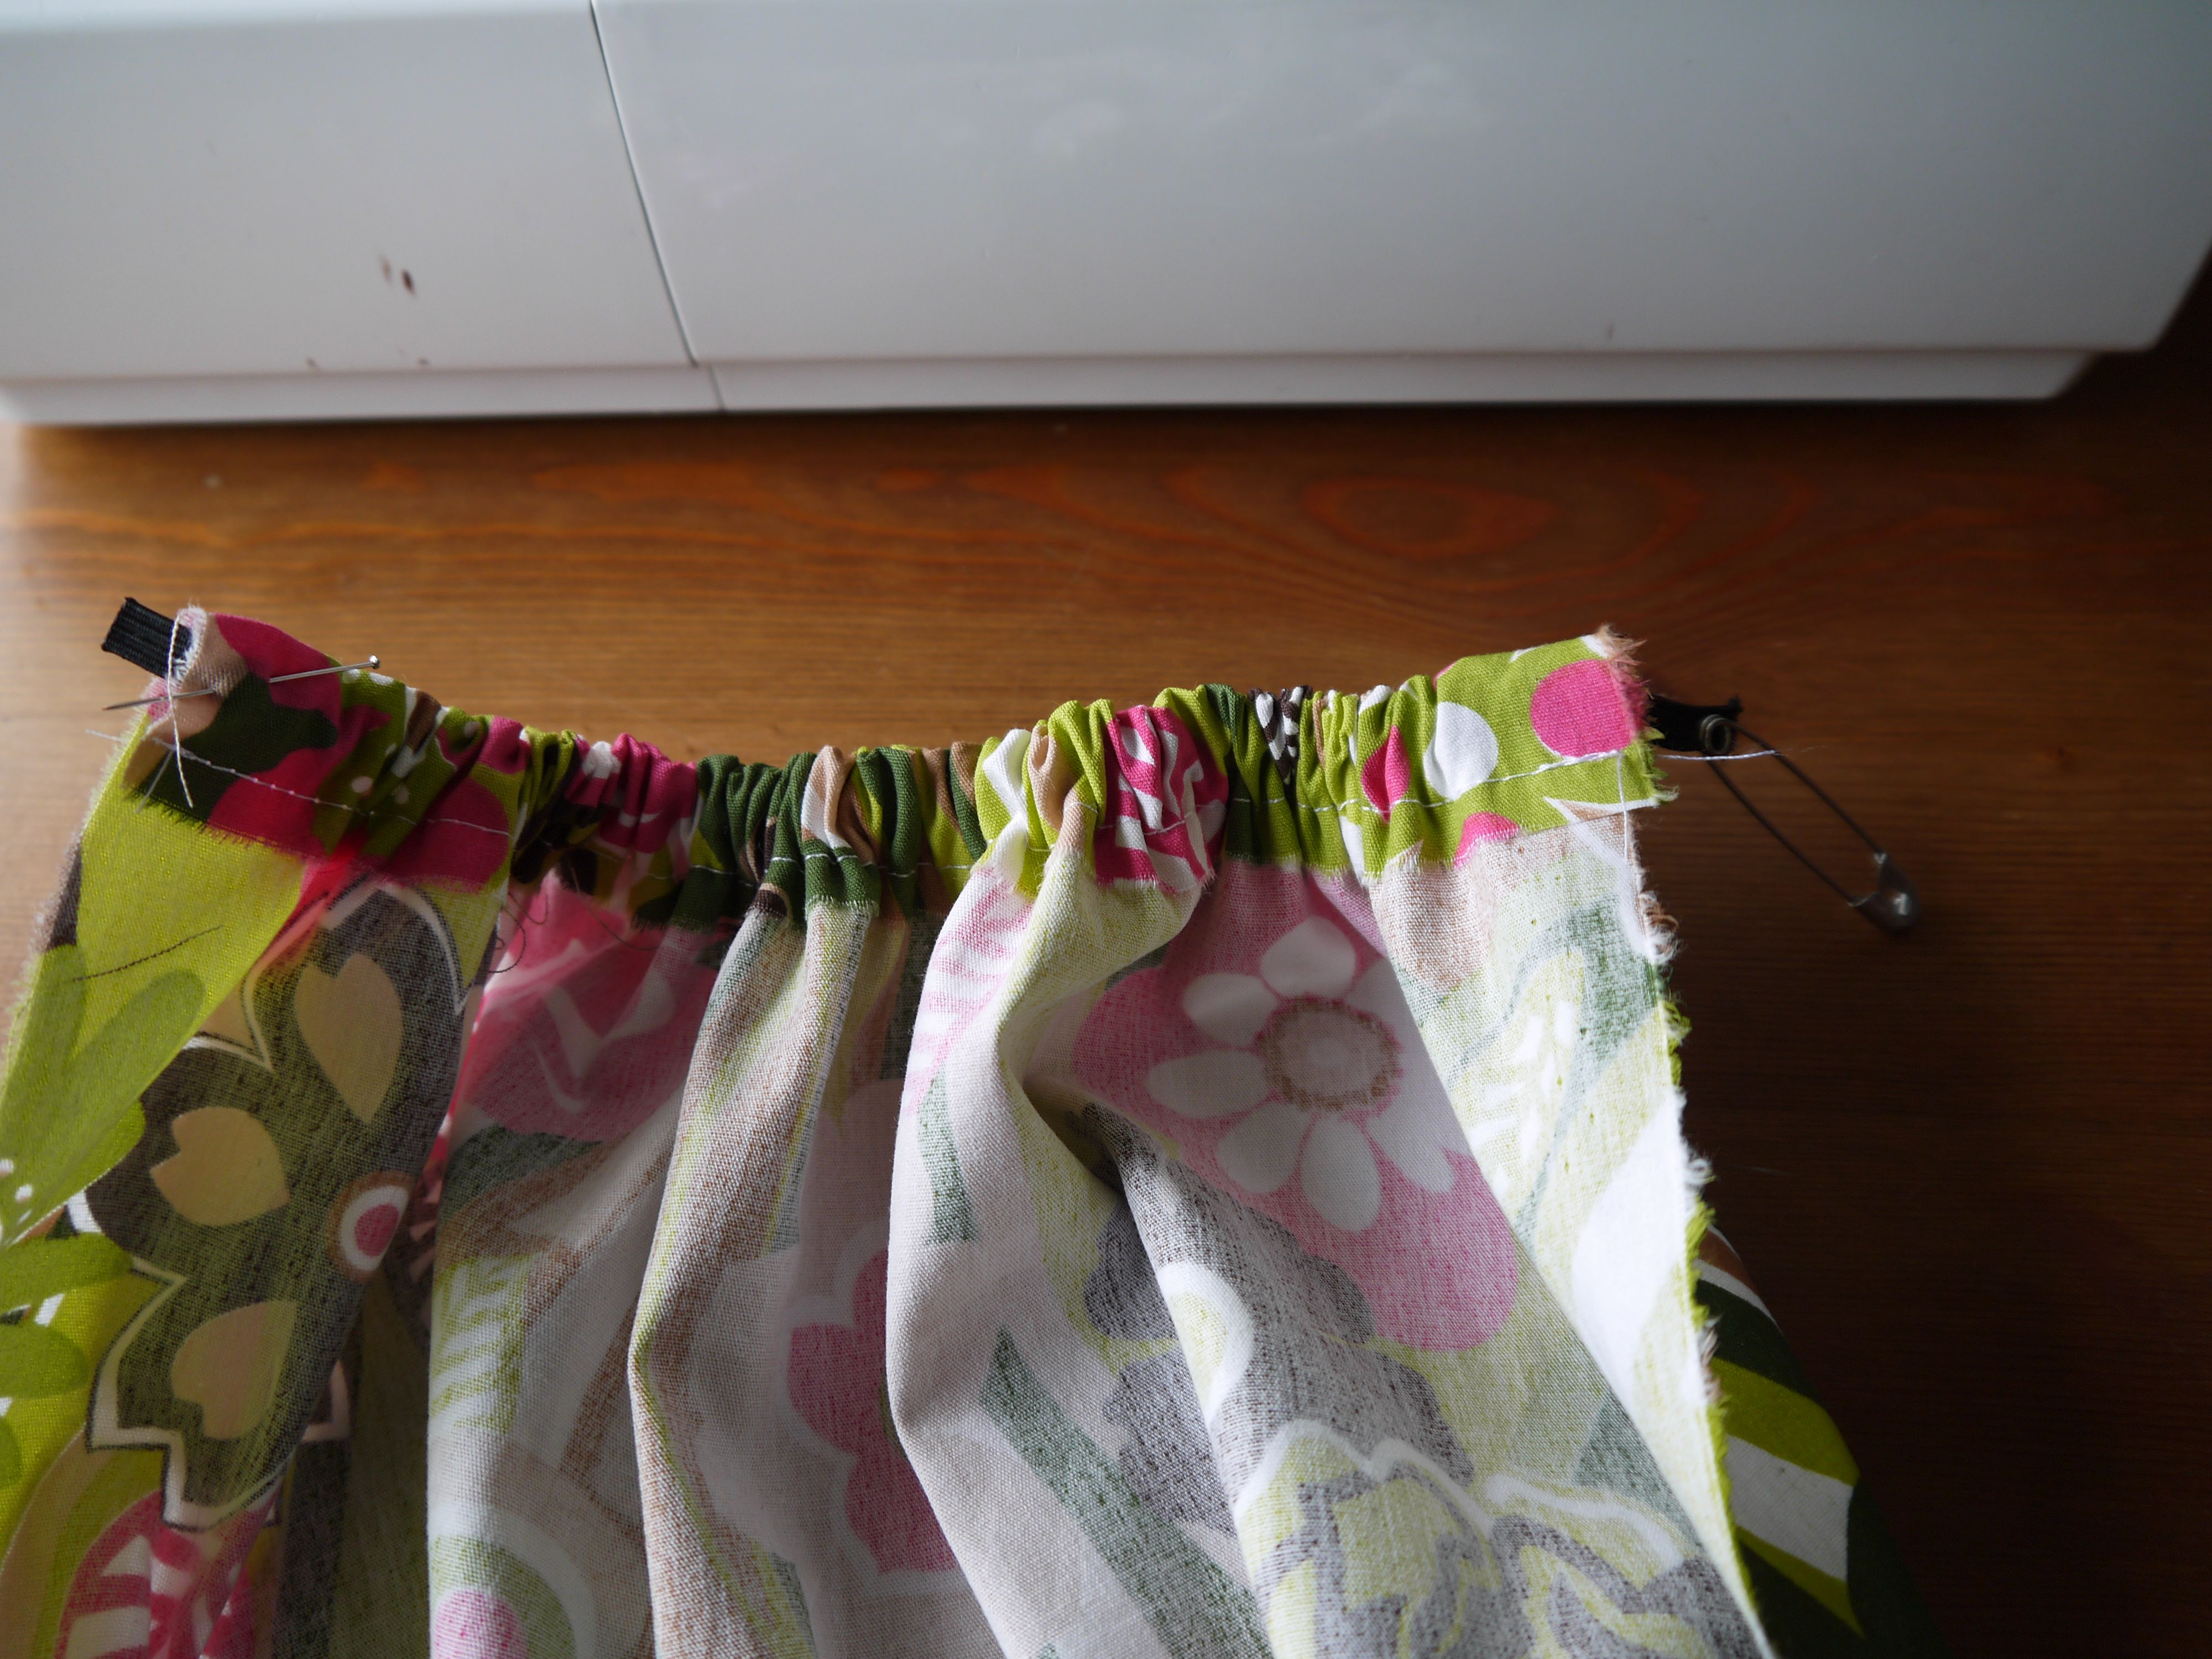 Tuto tr s simple le sac sac 39 tites mains - Tuto sac tricot en tissu ...